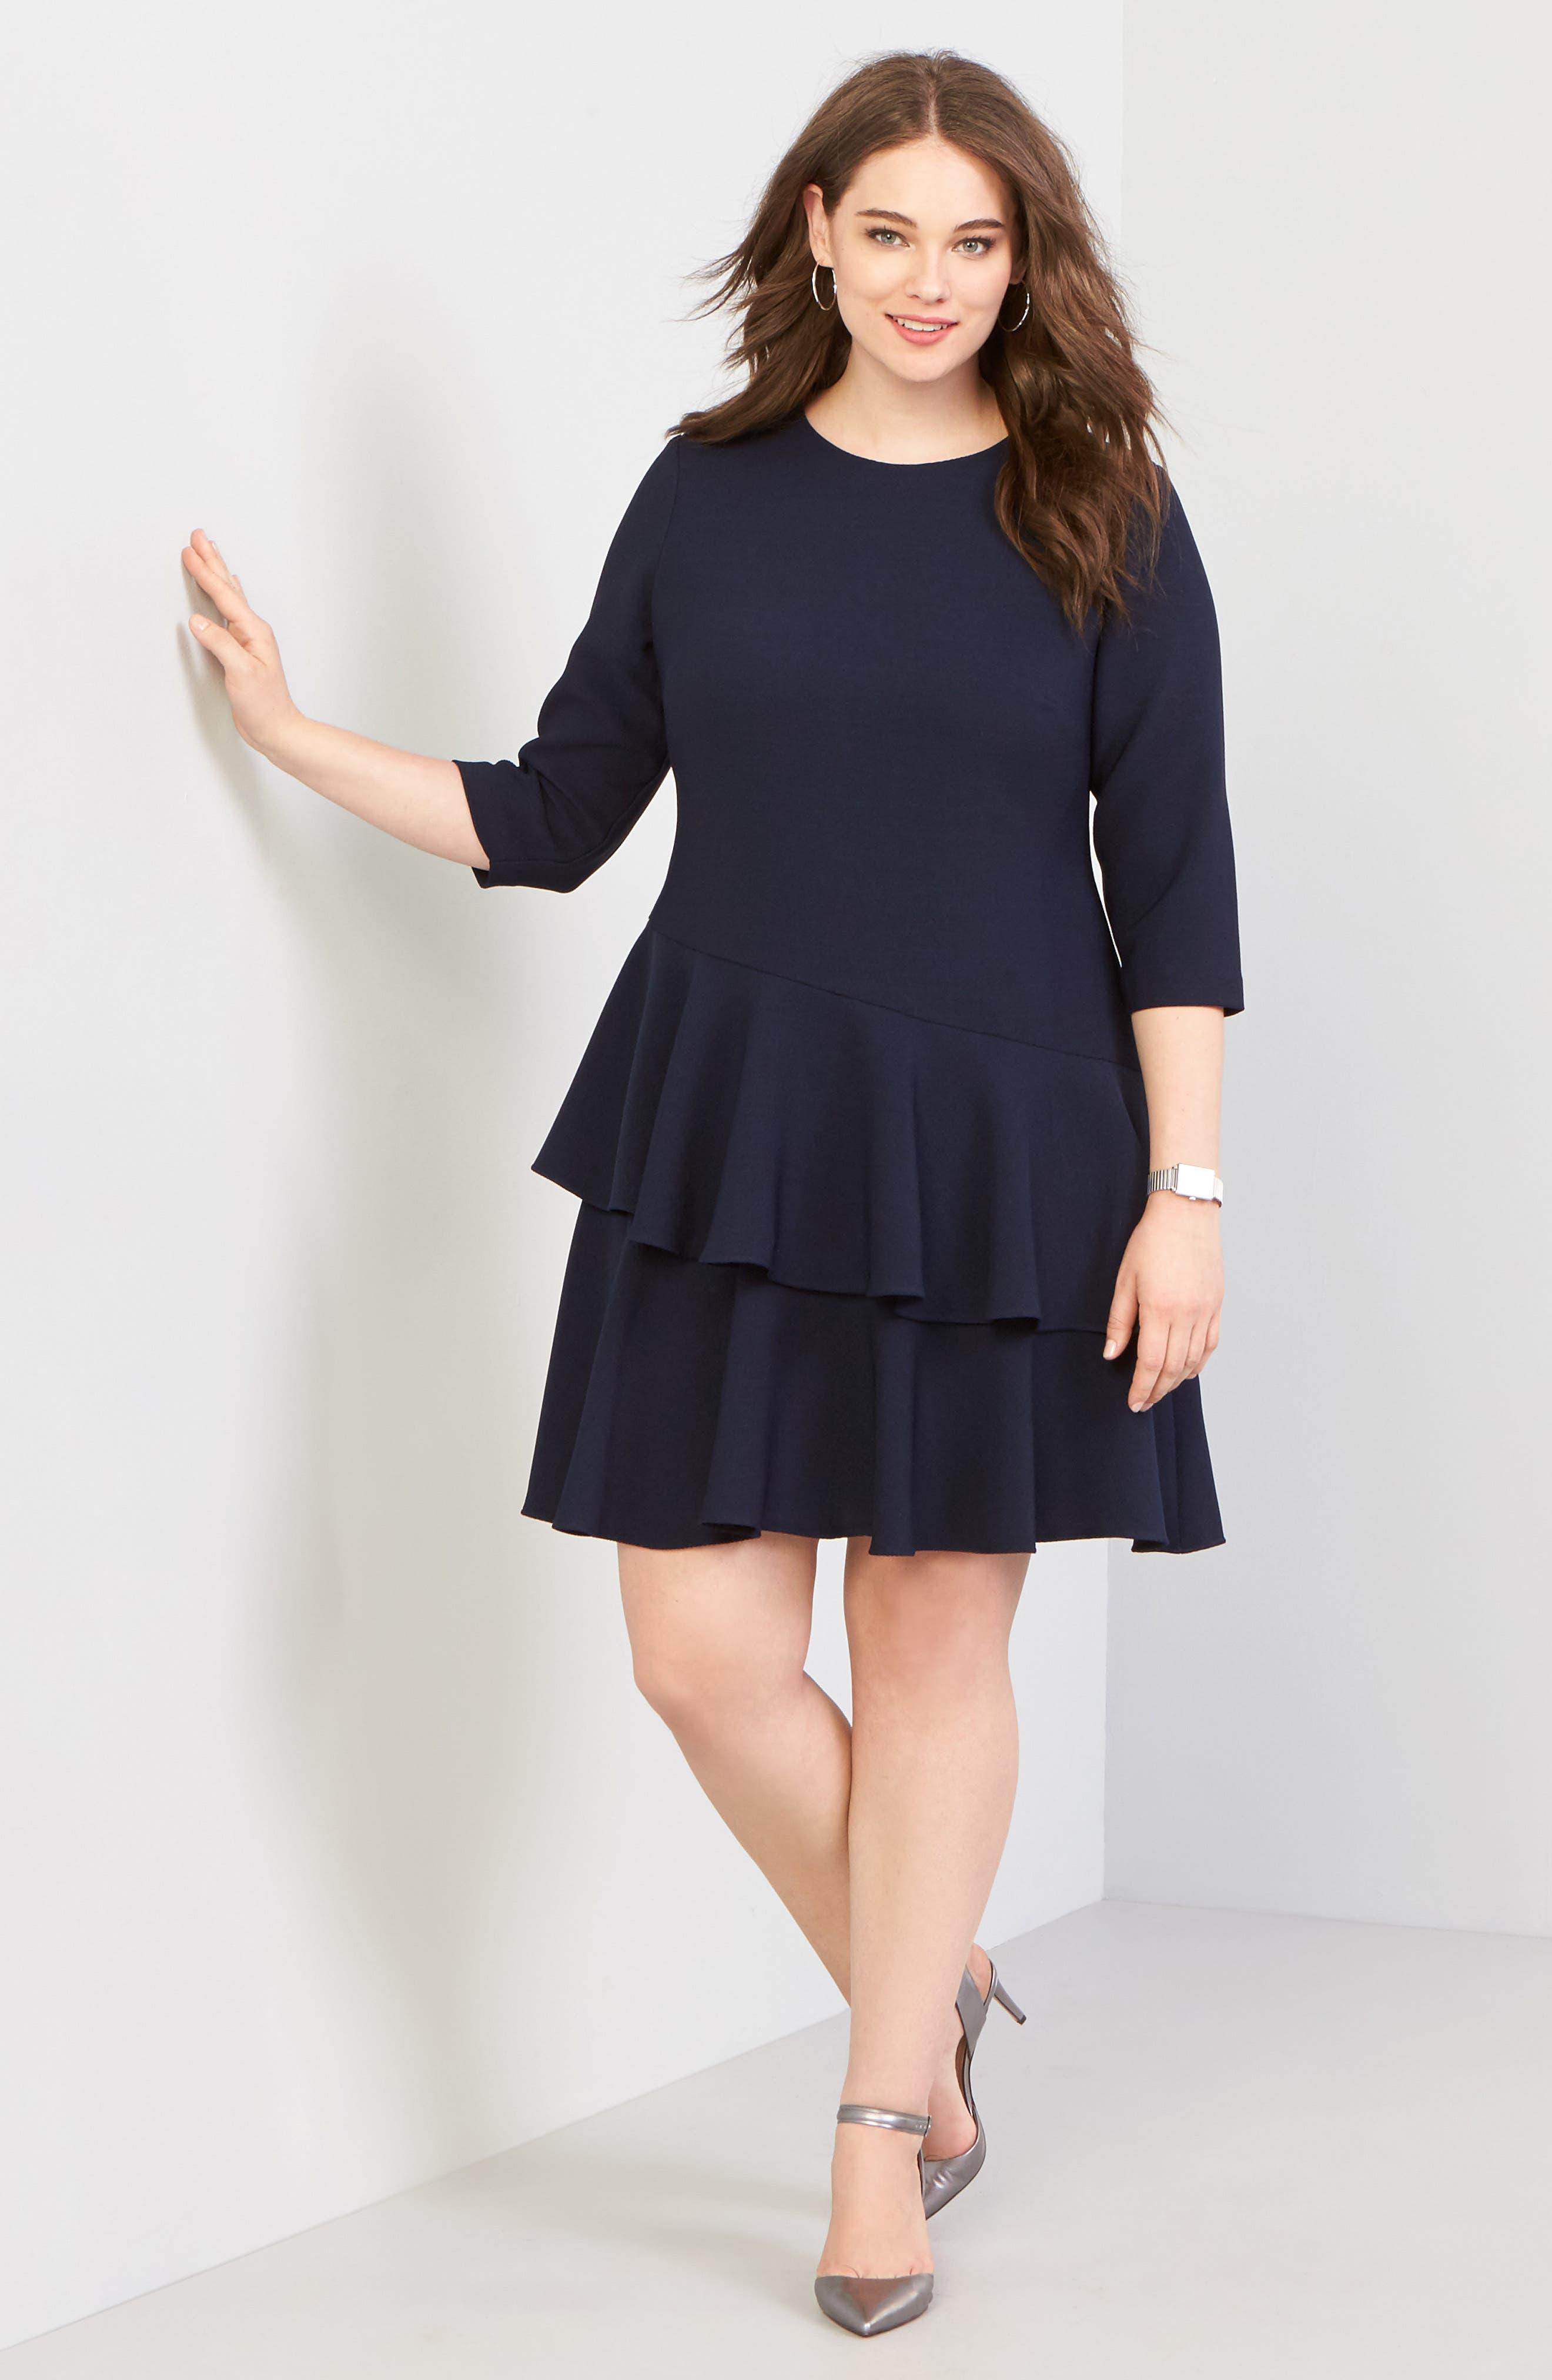 ELIZA J Ruffle Tiered Sheath Dress, Main, color, NAVY